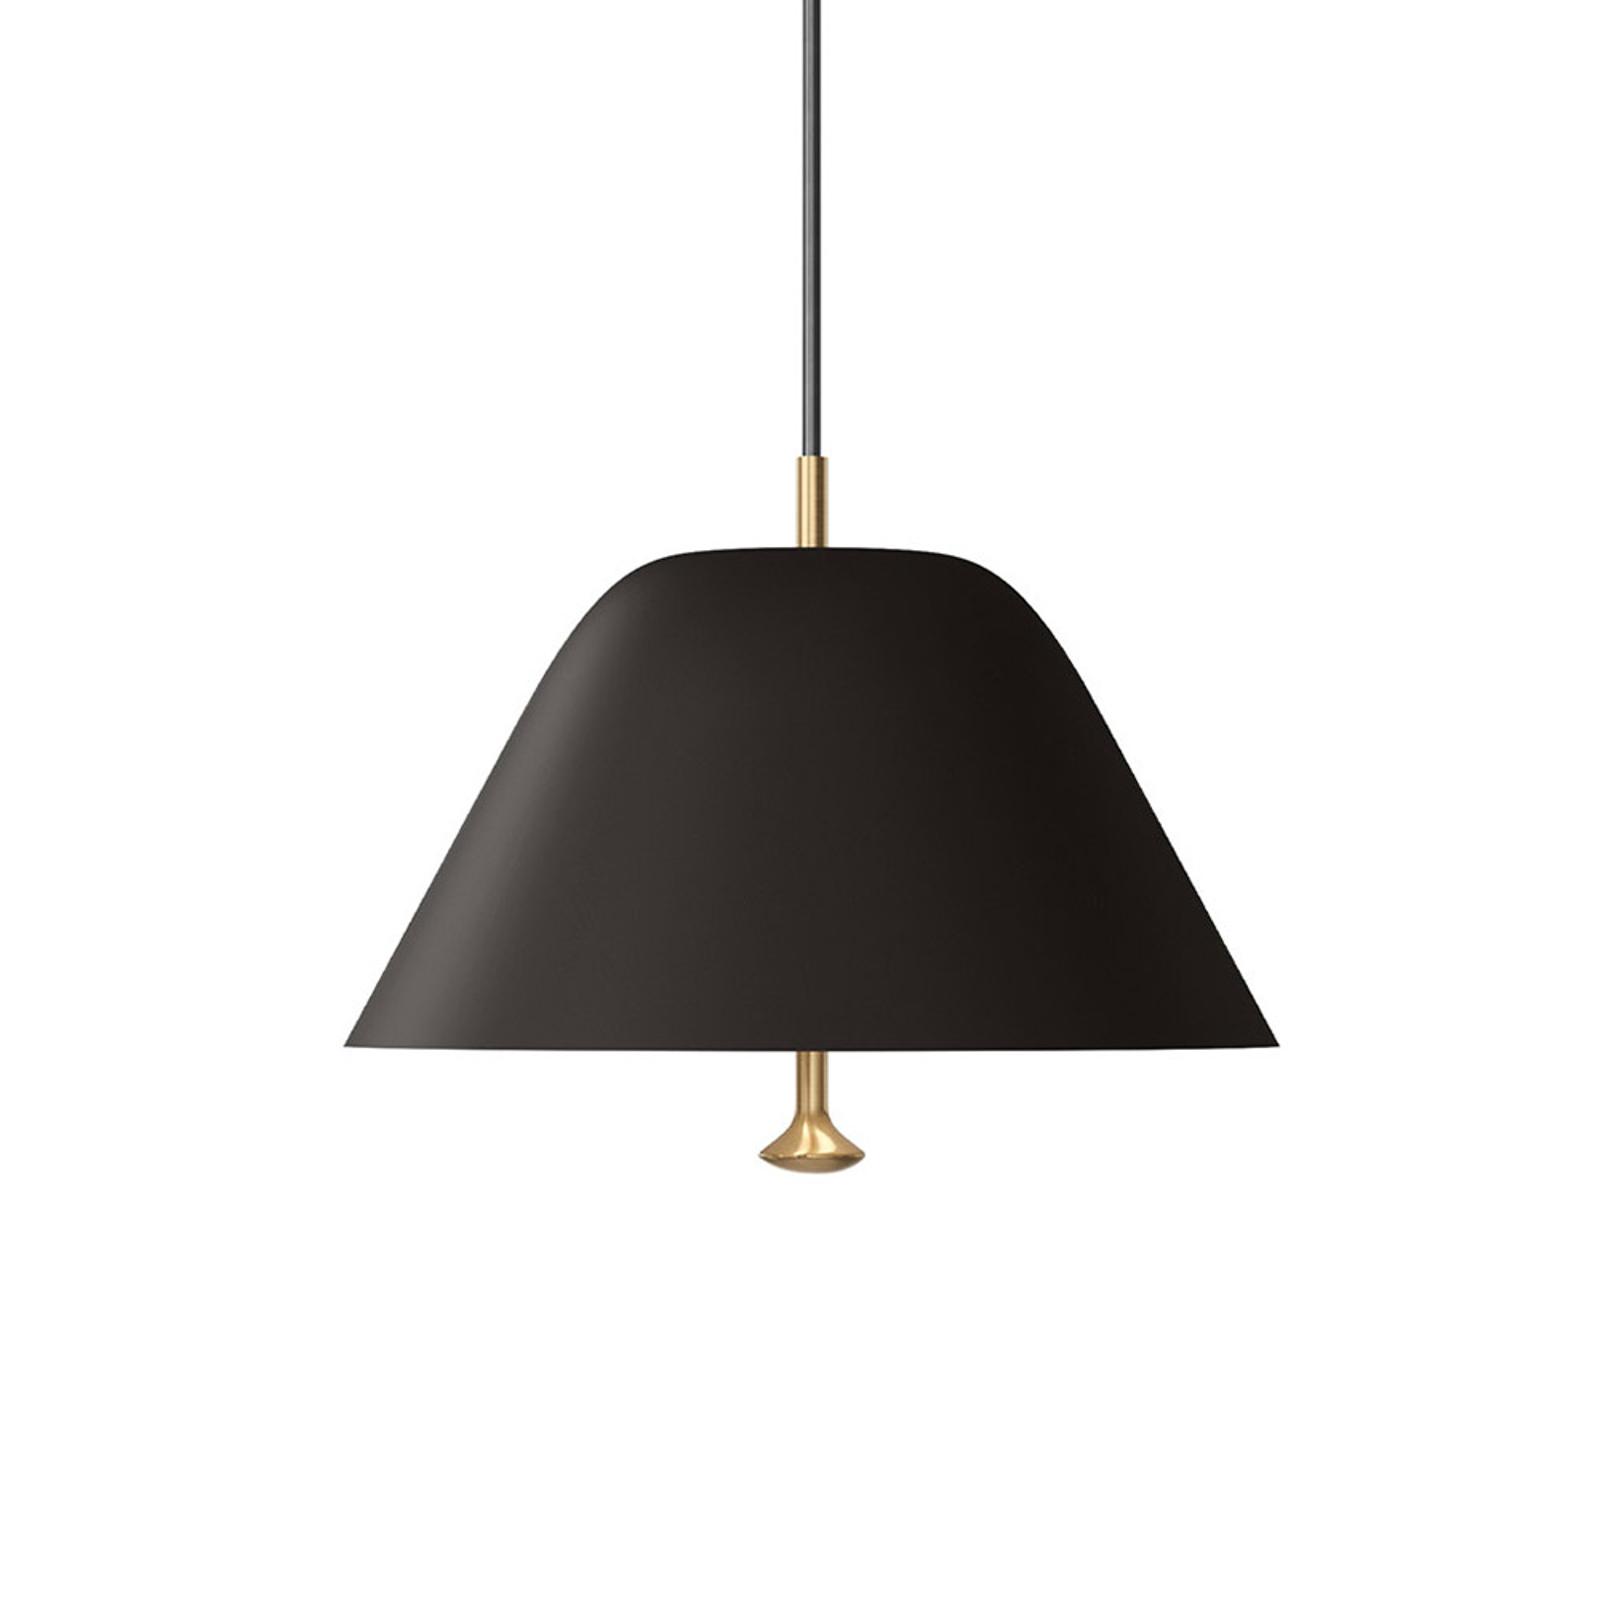 Menu Levitate hængelampe, Ø 28 cm, sort